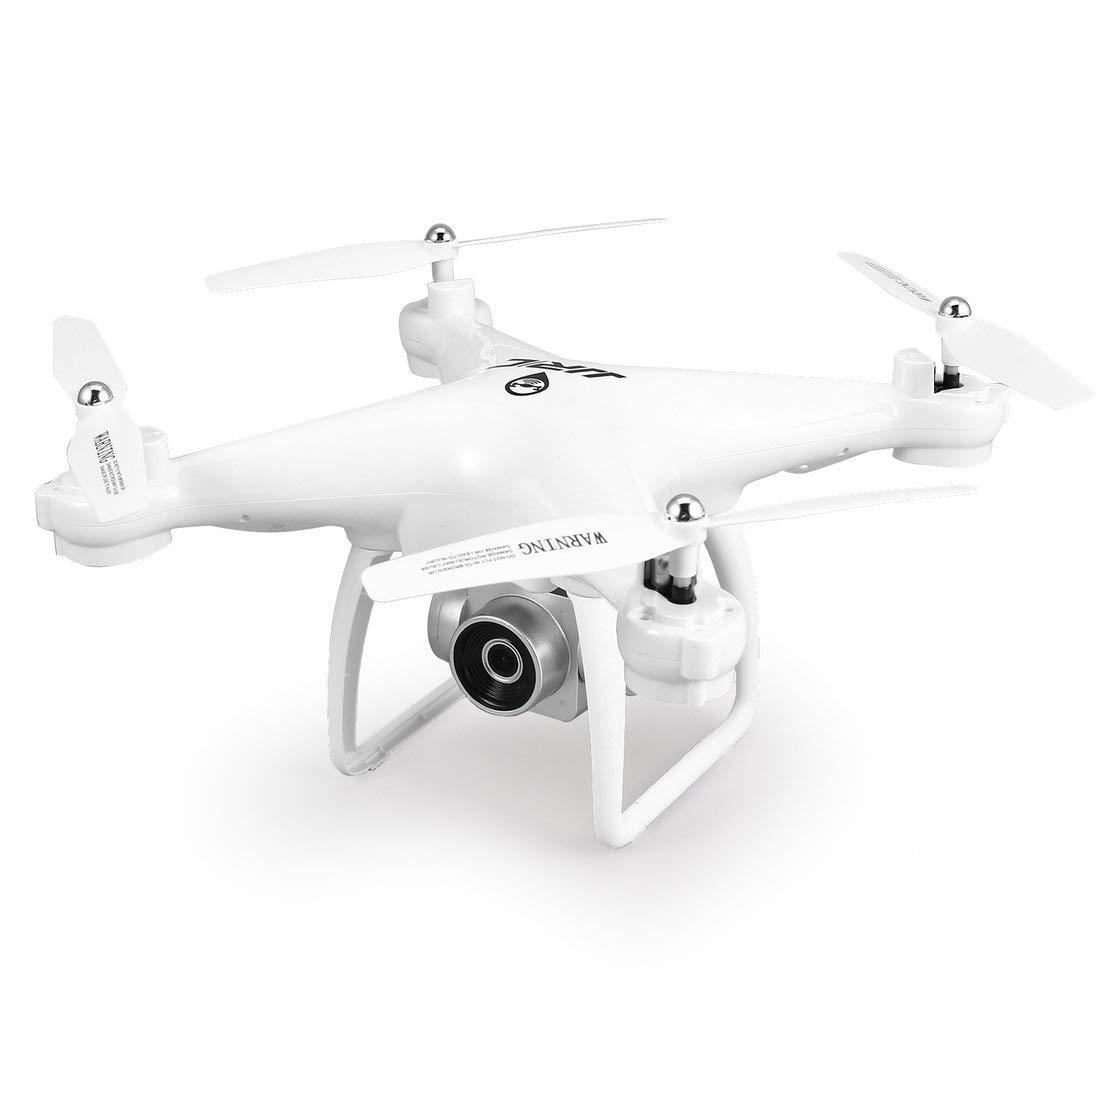 Hermosairis JJR / C H68G Selfie Dual-GPS-Positionierungs-RC-Drohne Quadcopter mit 1080P WiFi FPV Einstellbare Weitwinkelkamera Follow Me